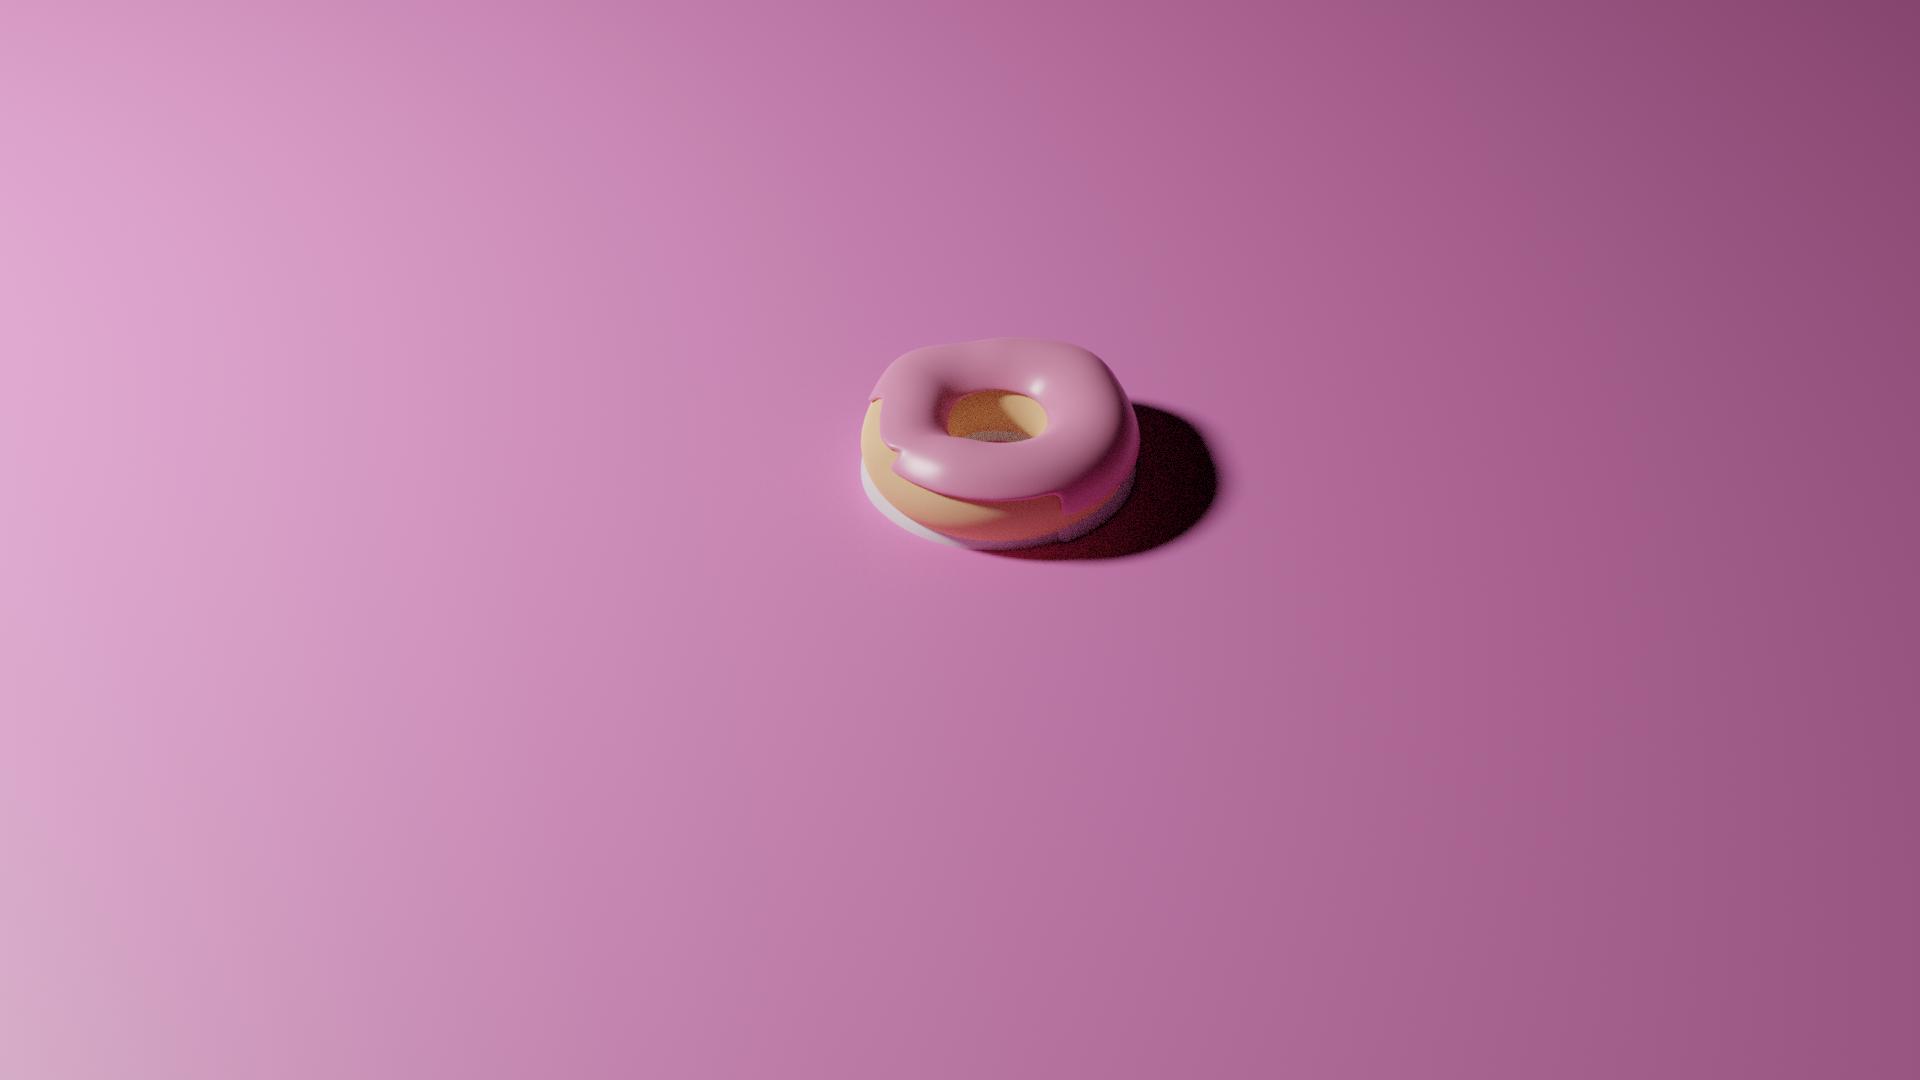 İlk renderım (açsan bakma donut var).png